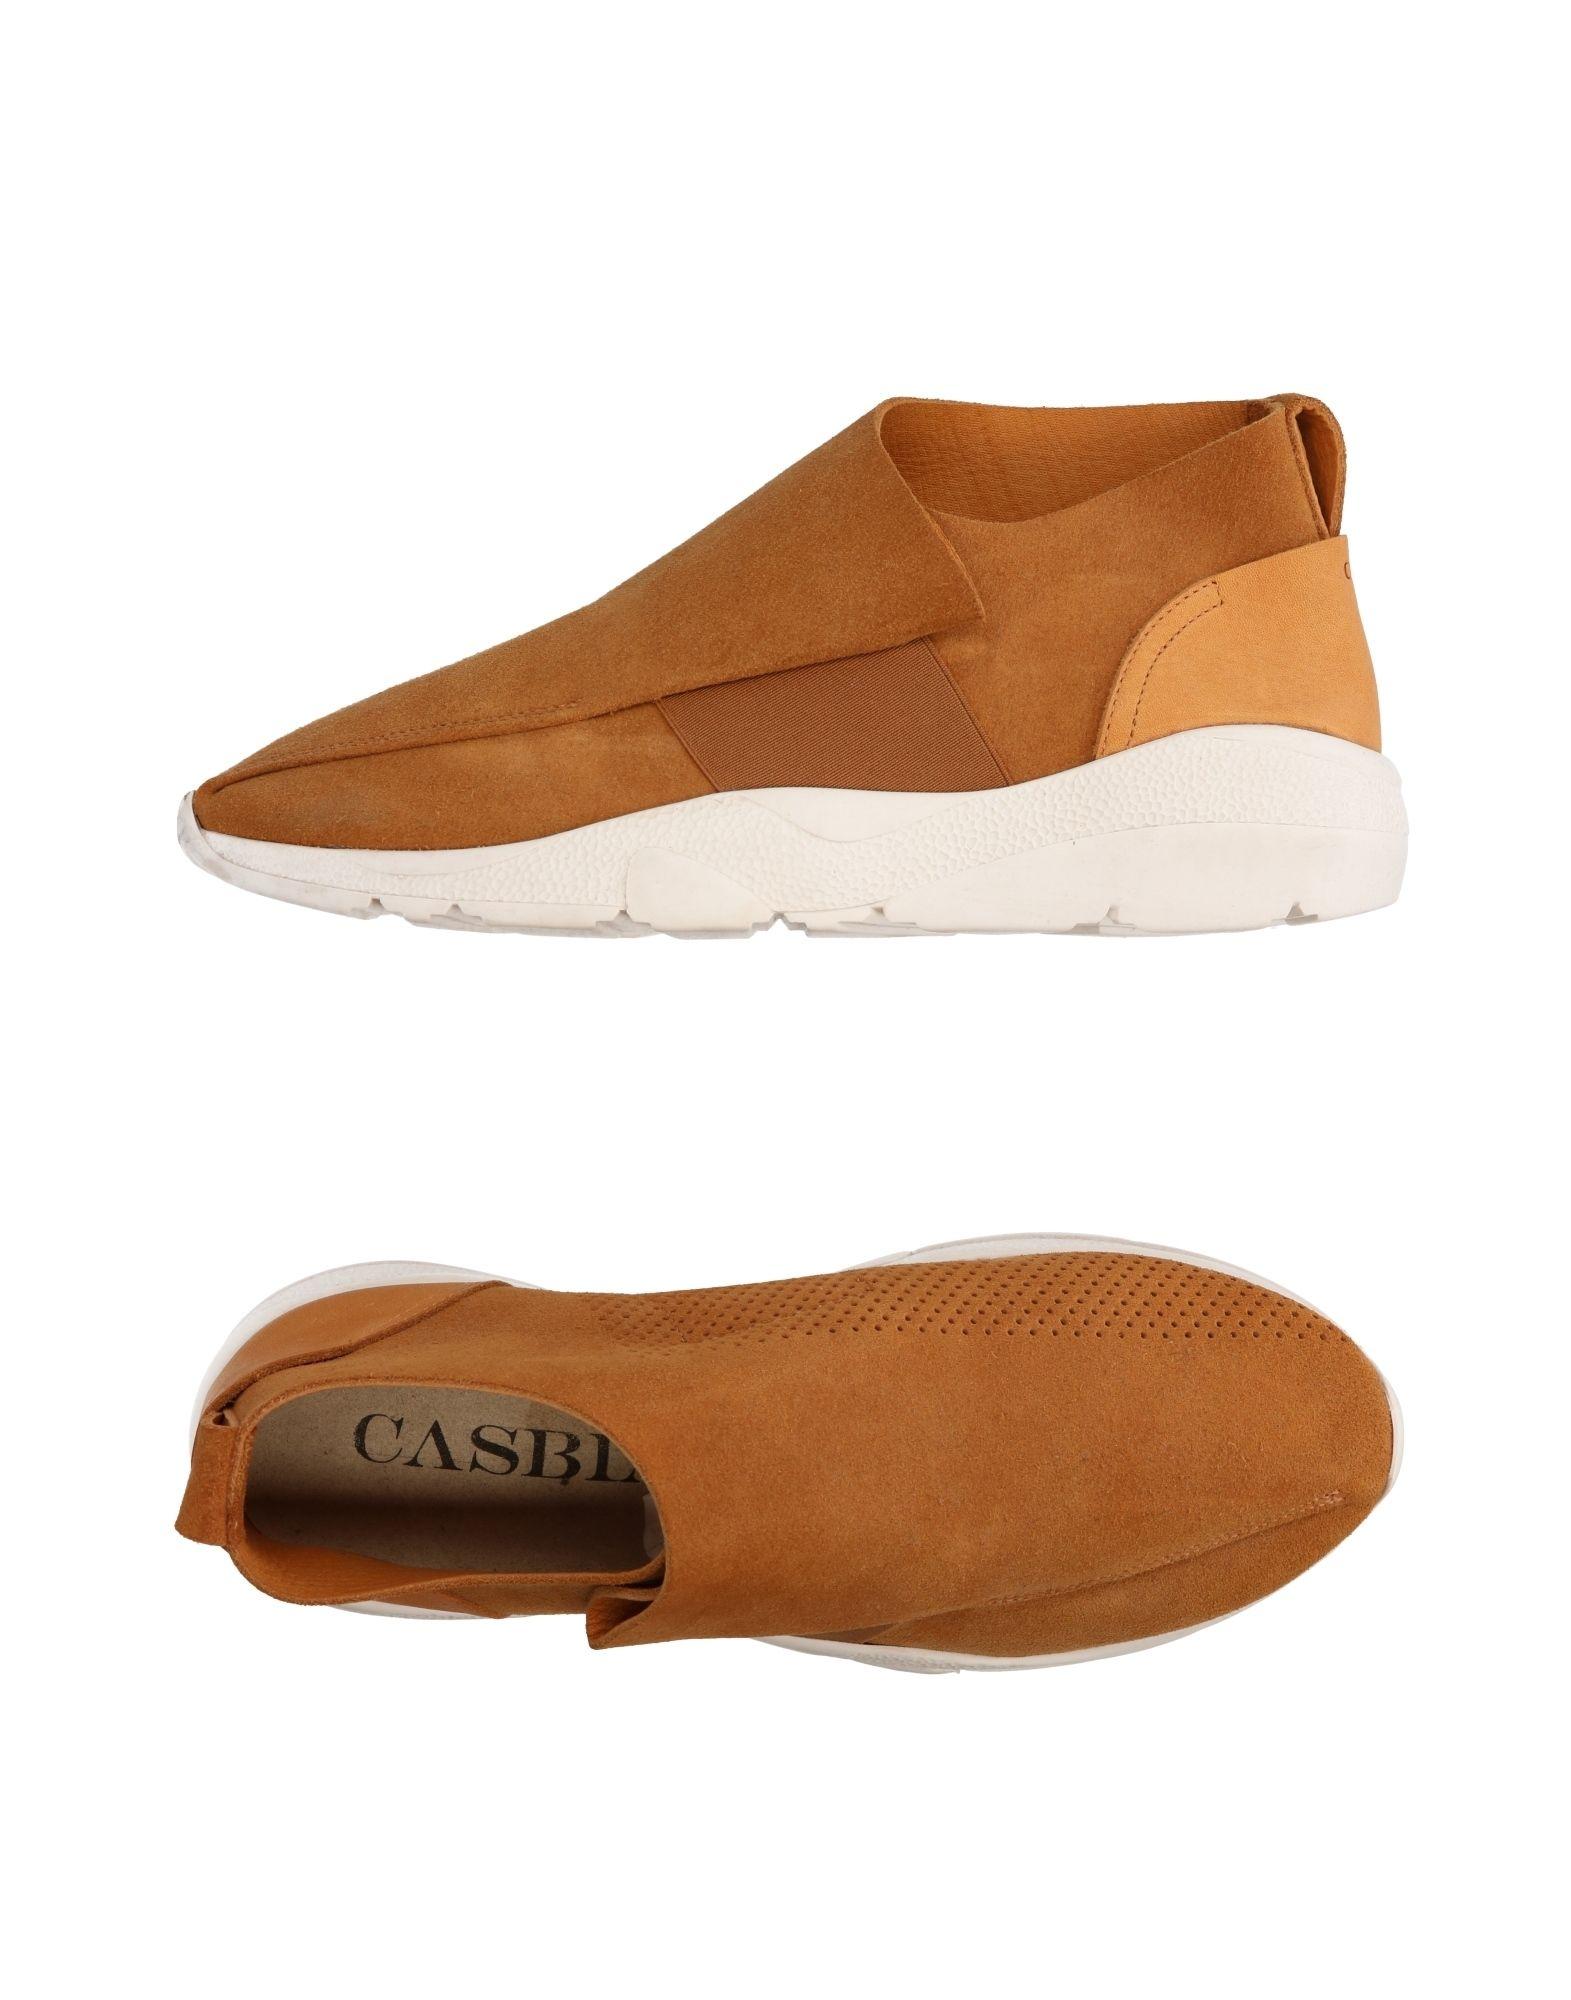 Casbia Sneakers Herren  11261253IF Gute Qualität beliebte Schuhe